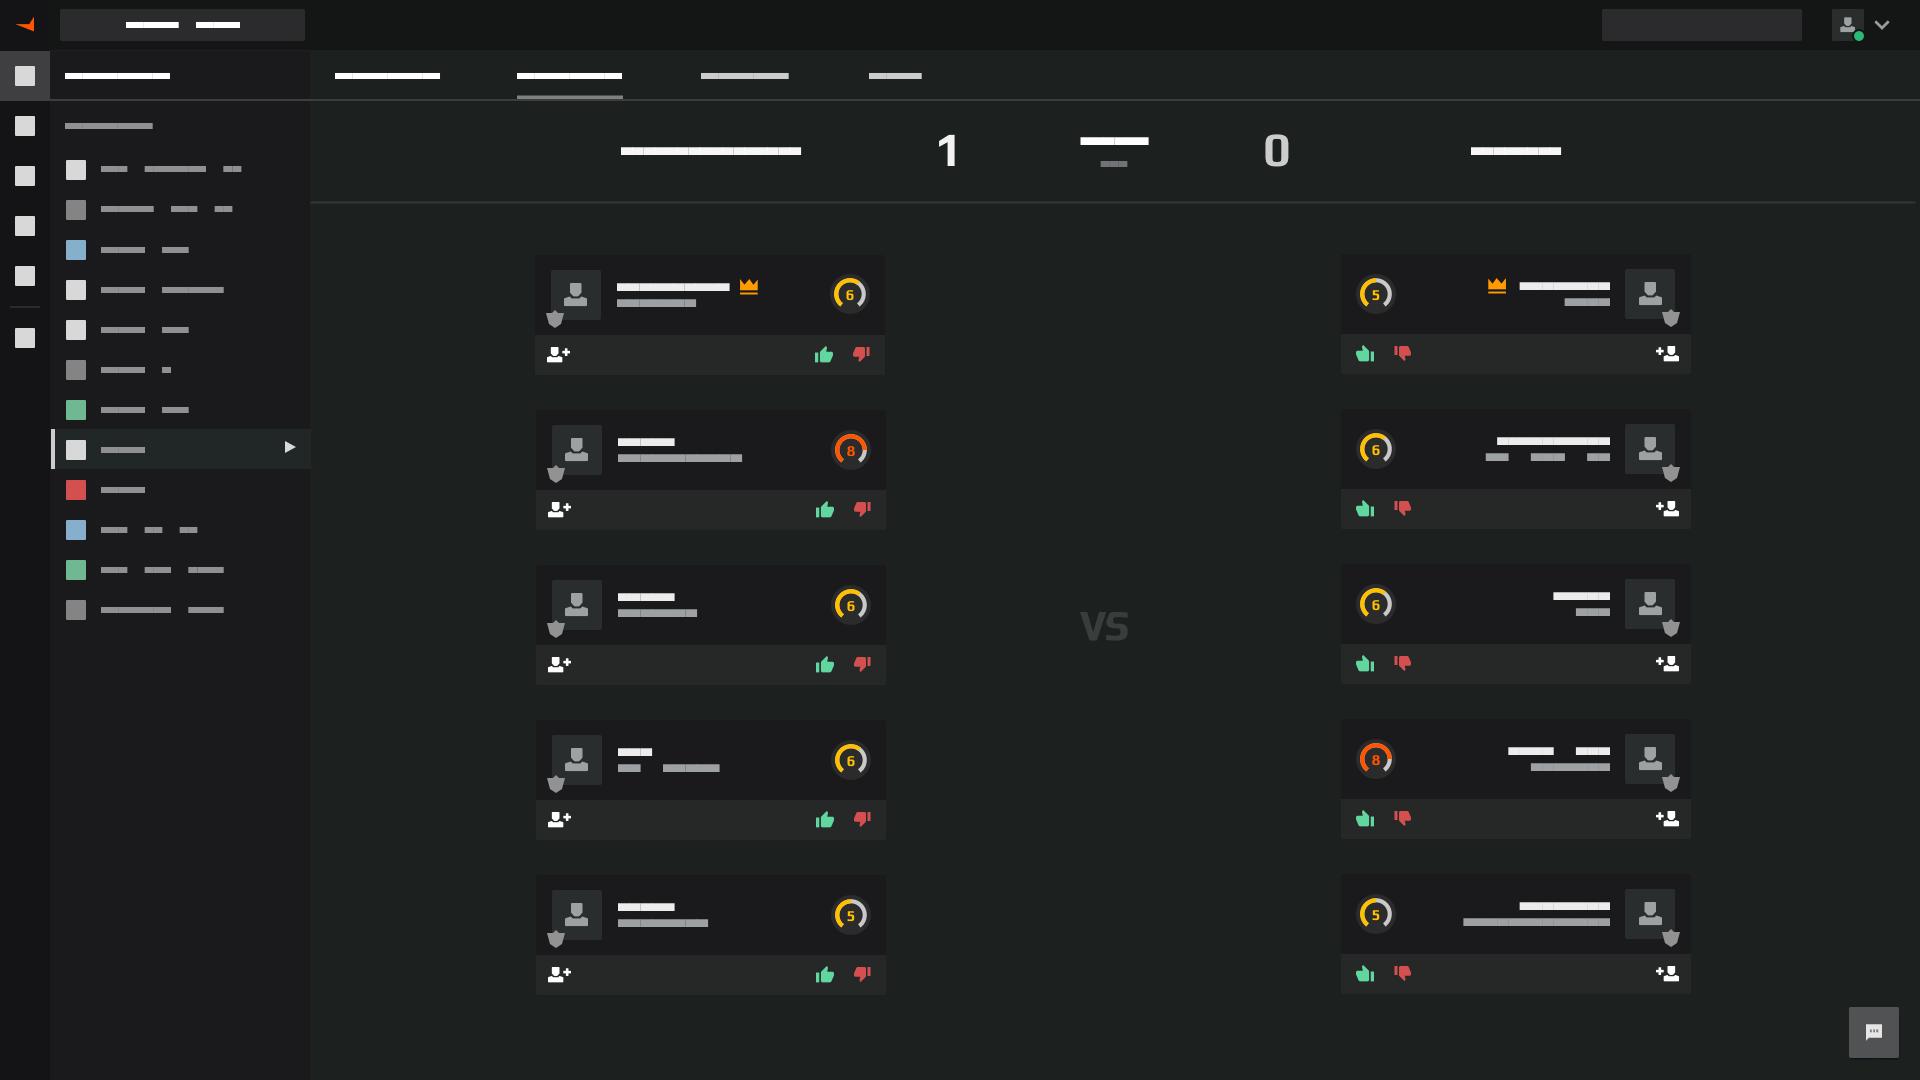 Cs go matchmaking servers status